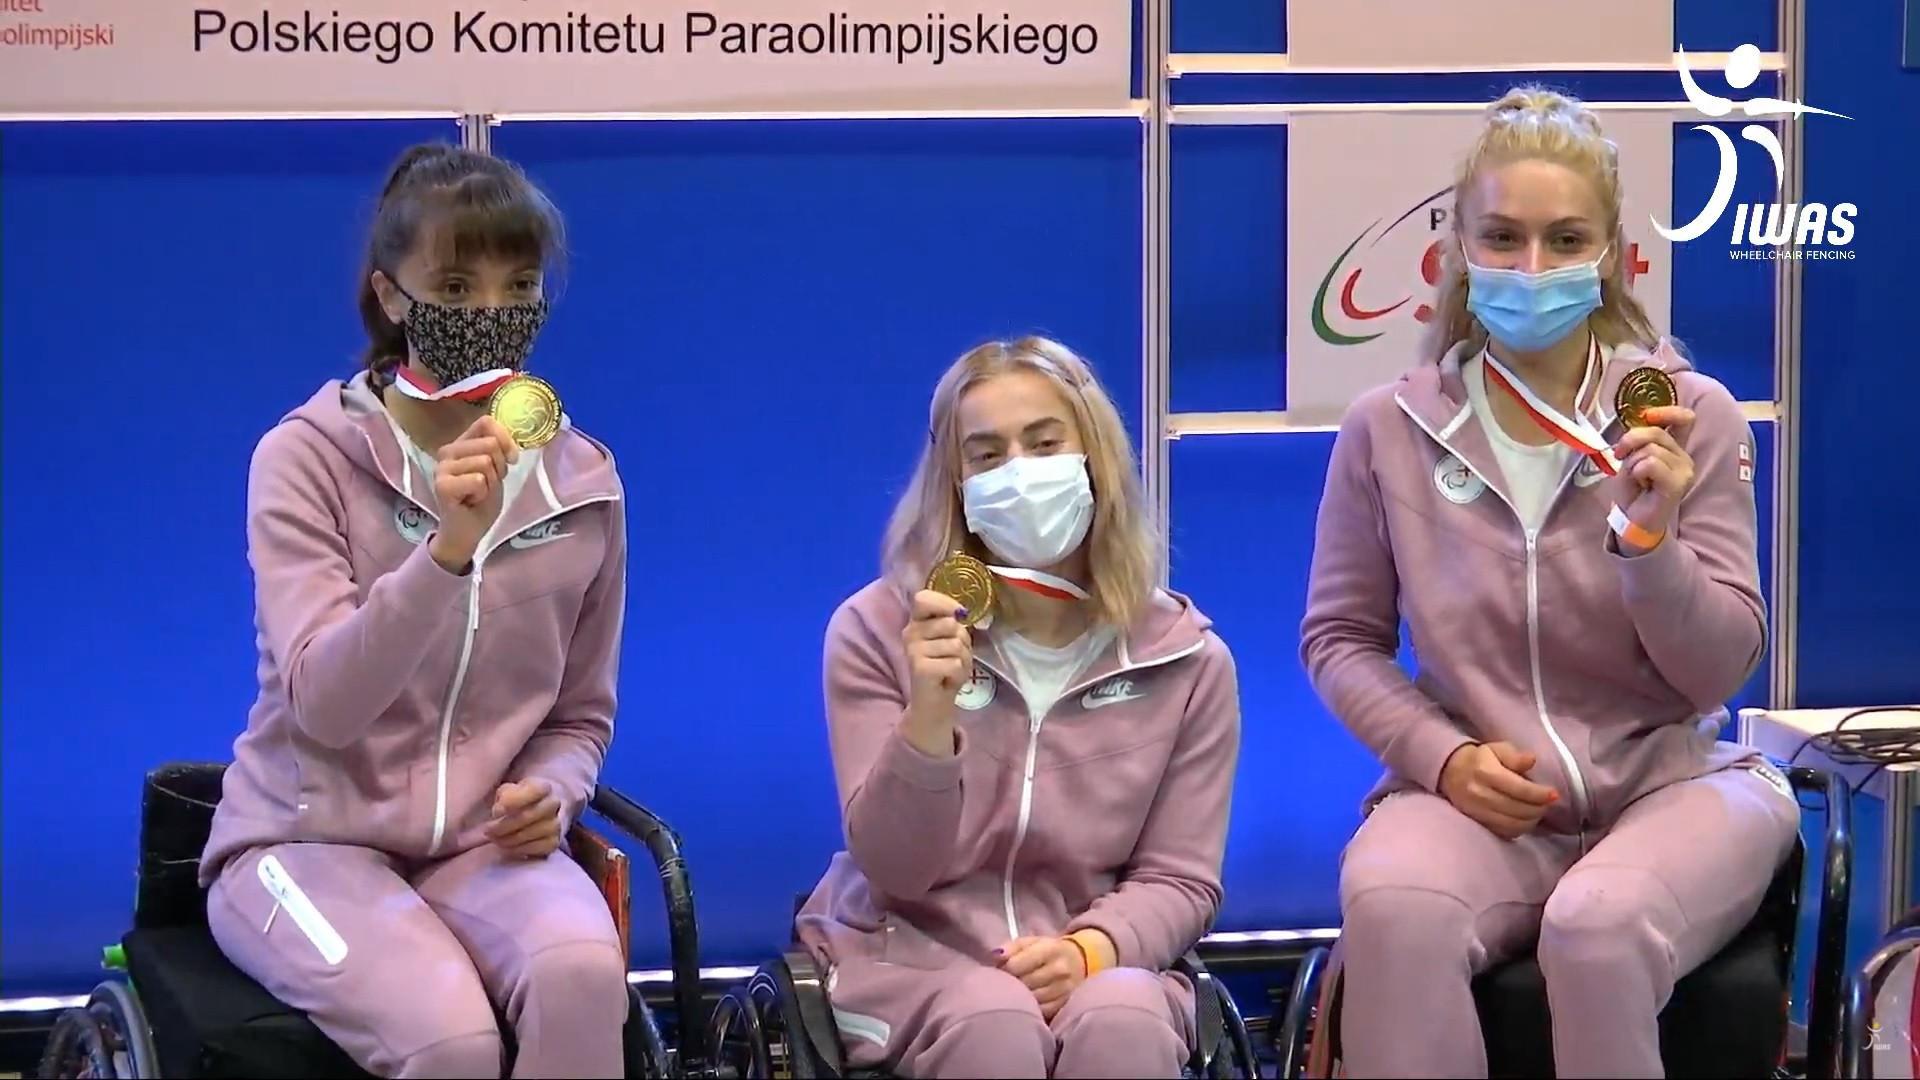 Georgia's Gvantsa Zadishvili, Nino Tibiashvili and Irma Khetsuriani, women's world team sabre title gold medallists, will be in action at the IWAS Wheelchair Fencing World Cup starting in Warsaw tomorrow ©IWAS